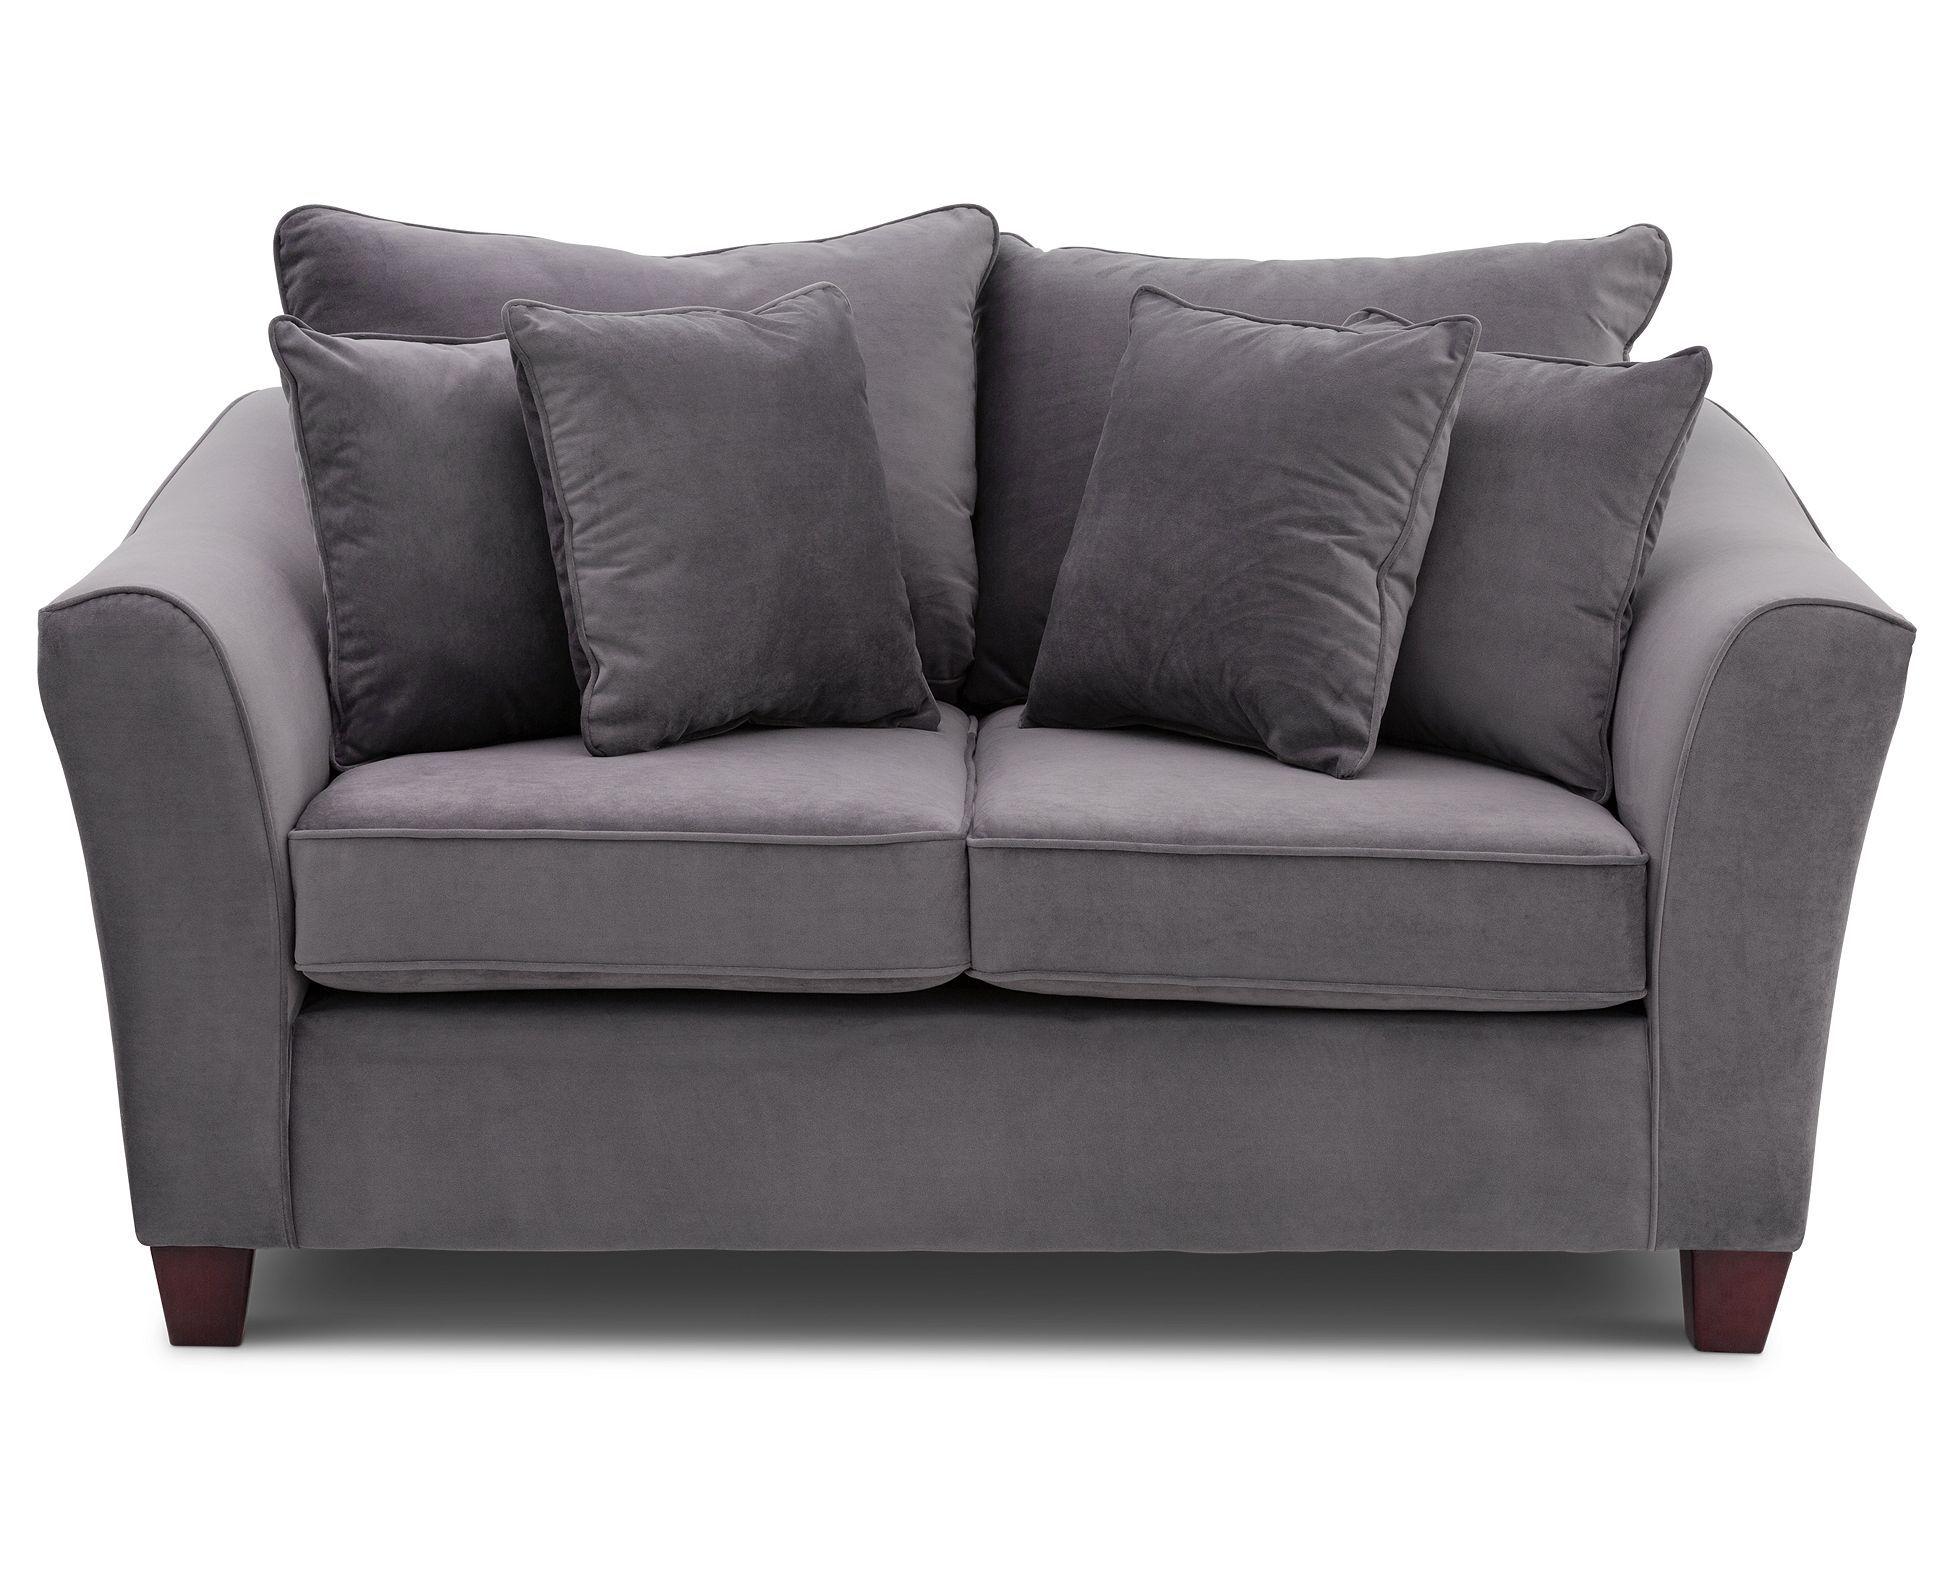 Lenox Loveseat Furniture Row Rowe furniture, Love seat